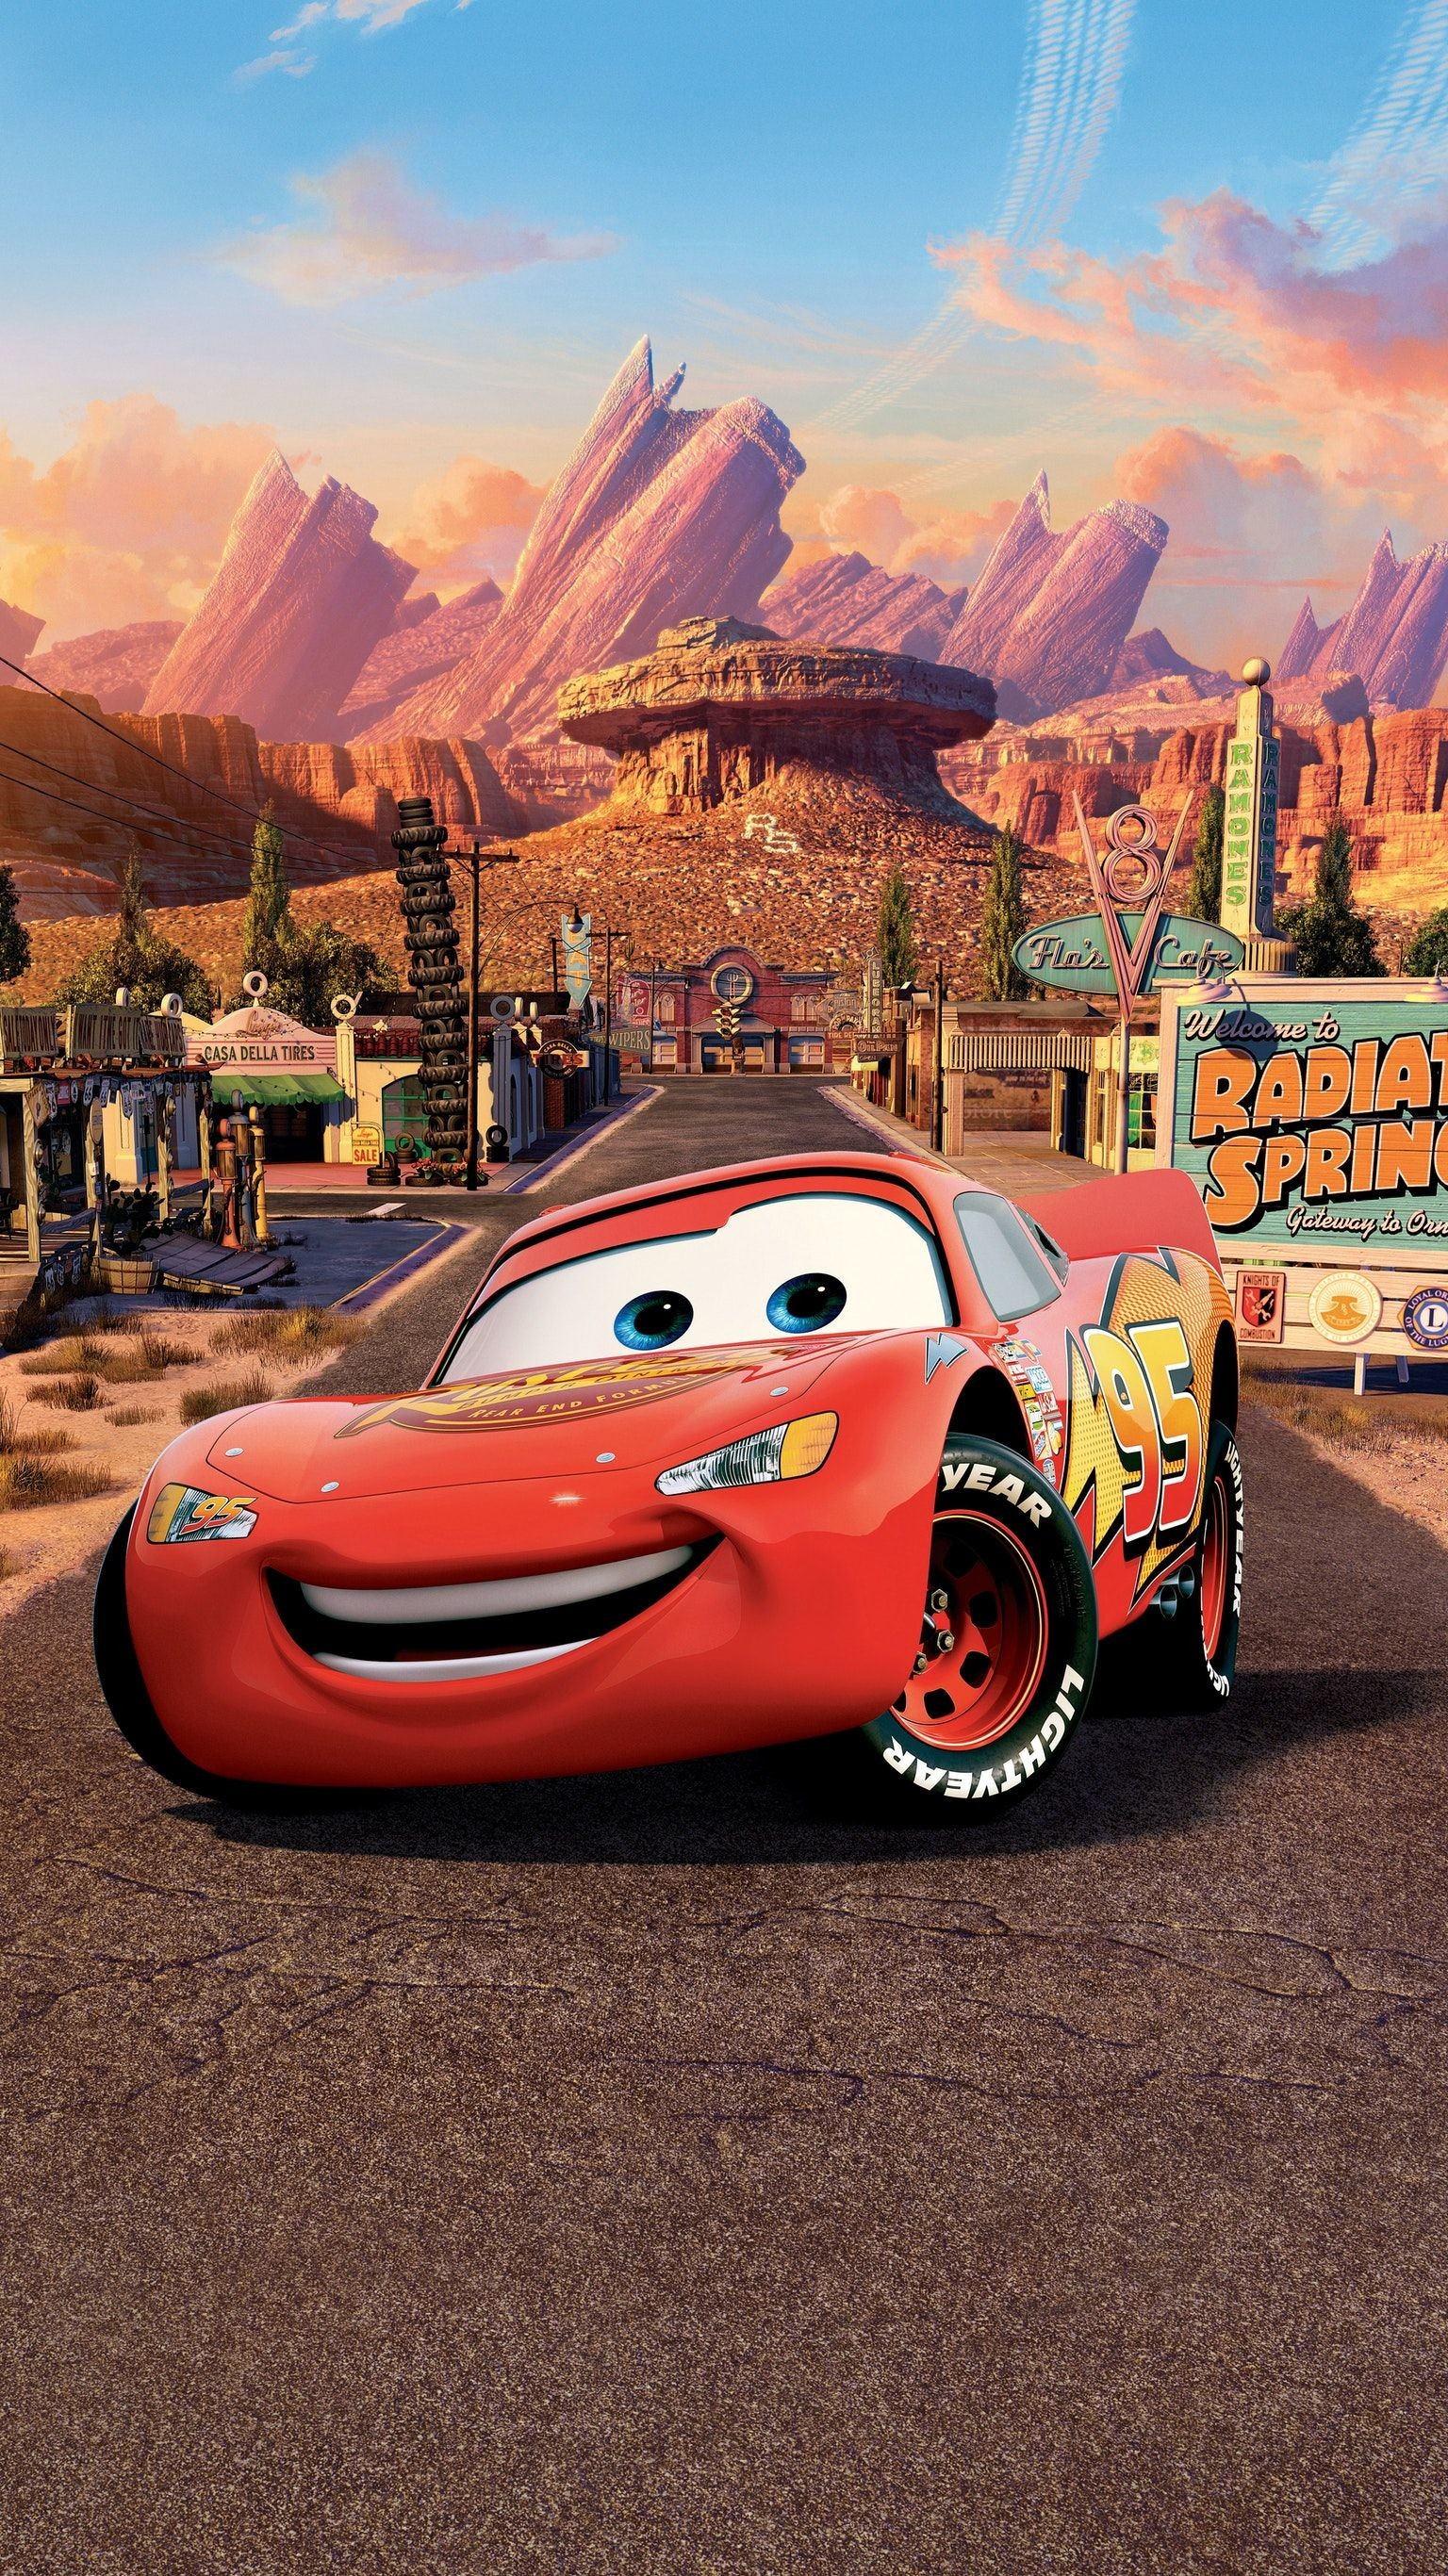 Pixar Cars Wallpaper Posted By Sarah Walker